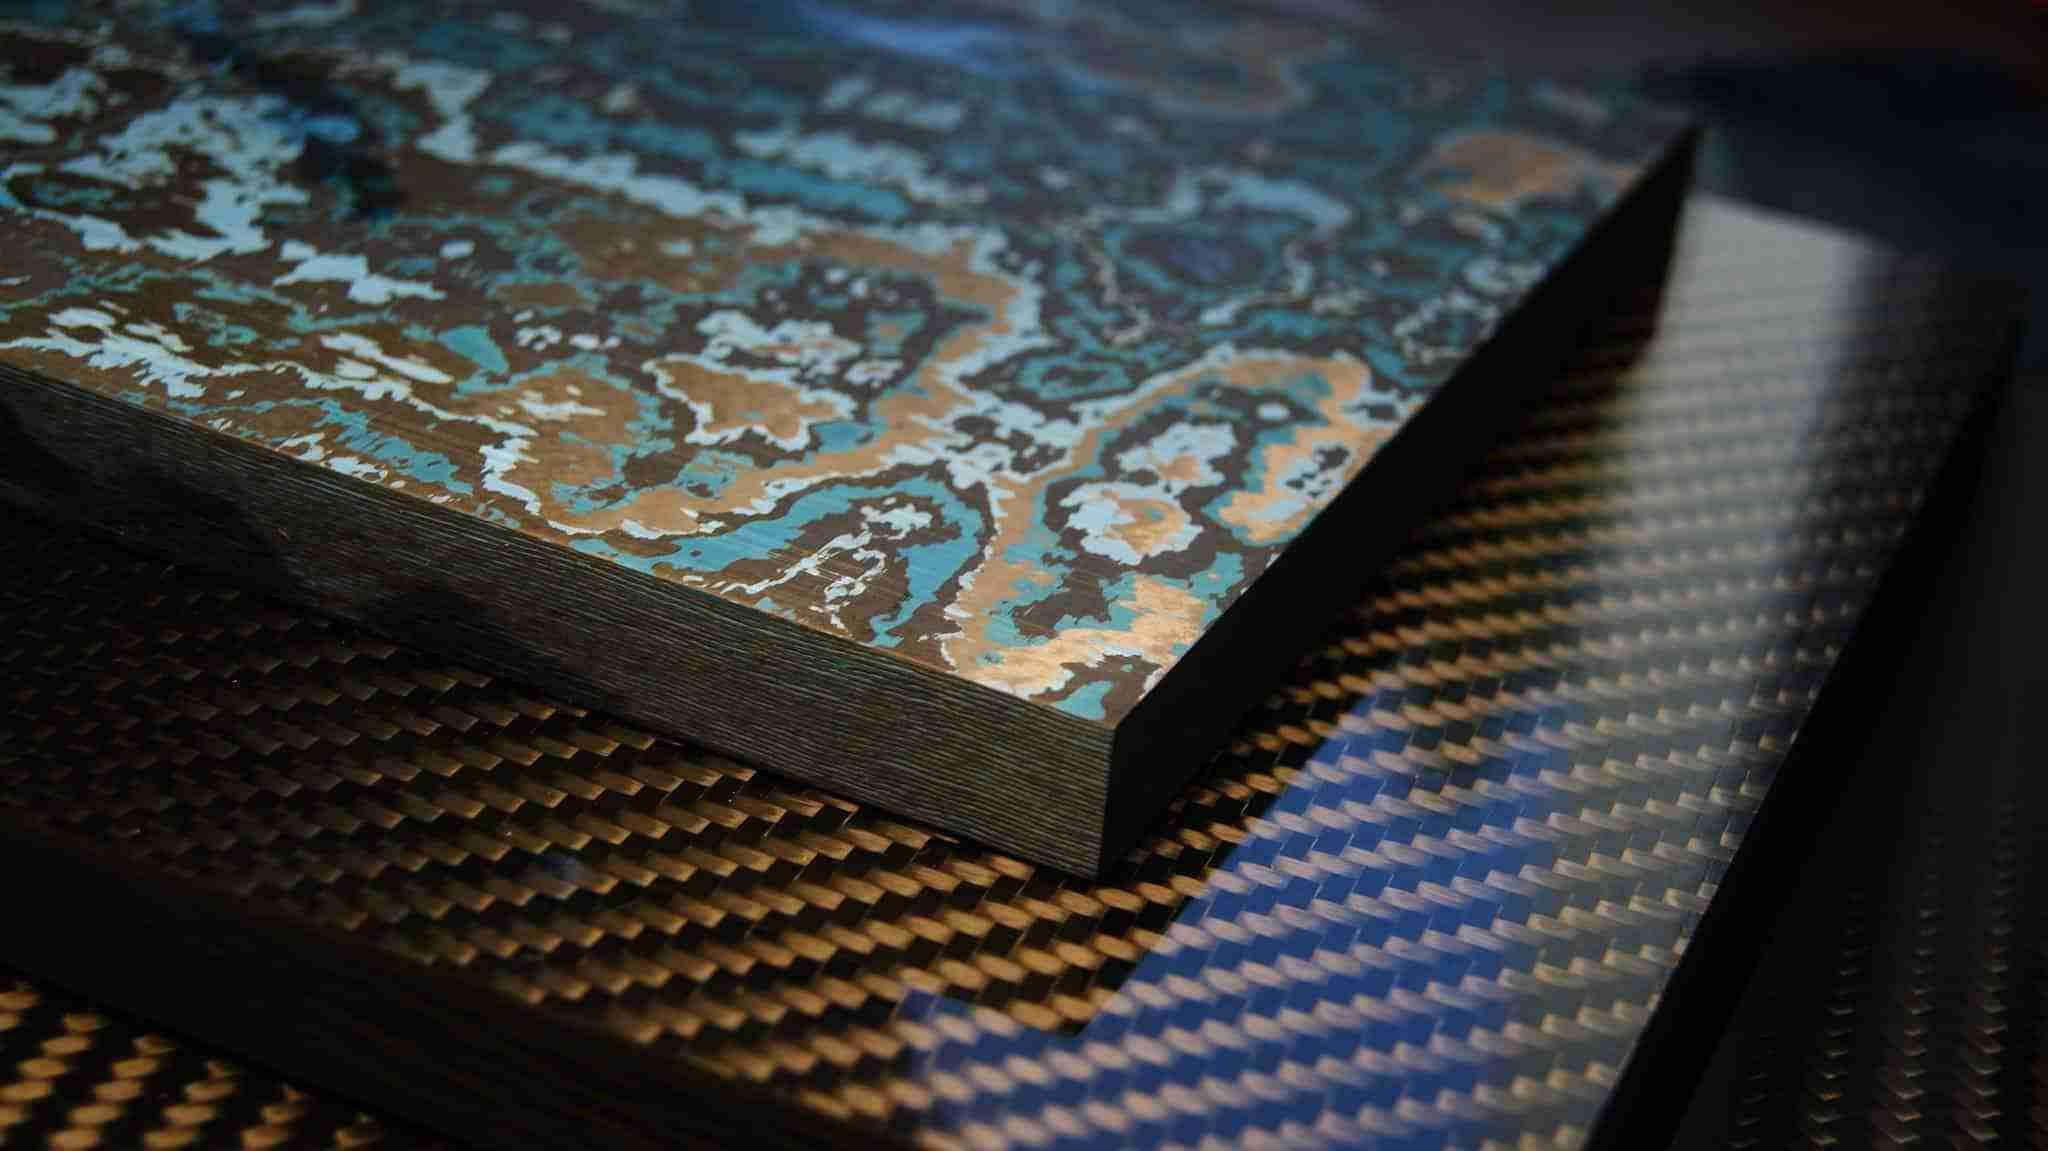 Fat Carbon Materials, i manici in carbonio composito